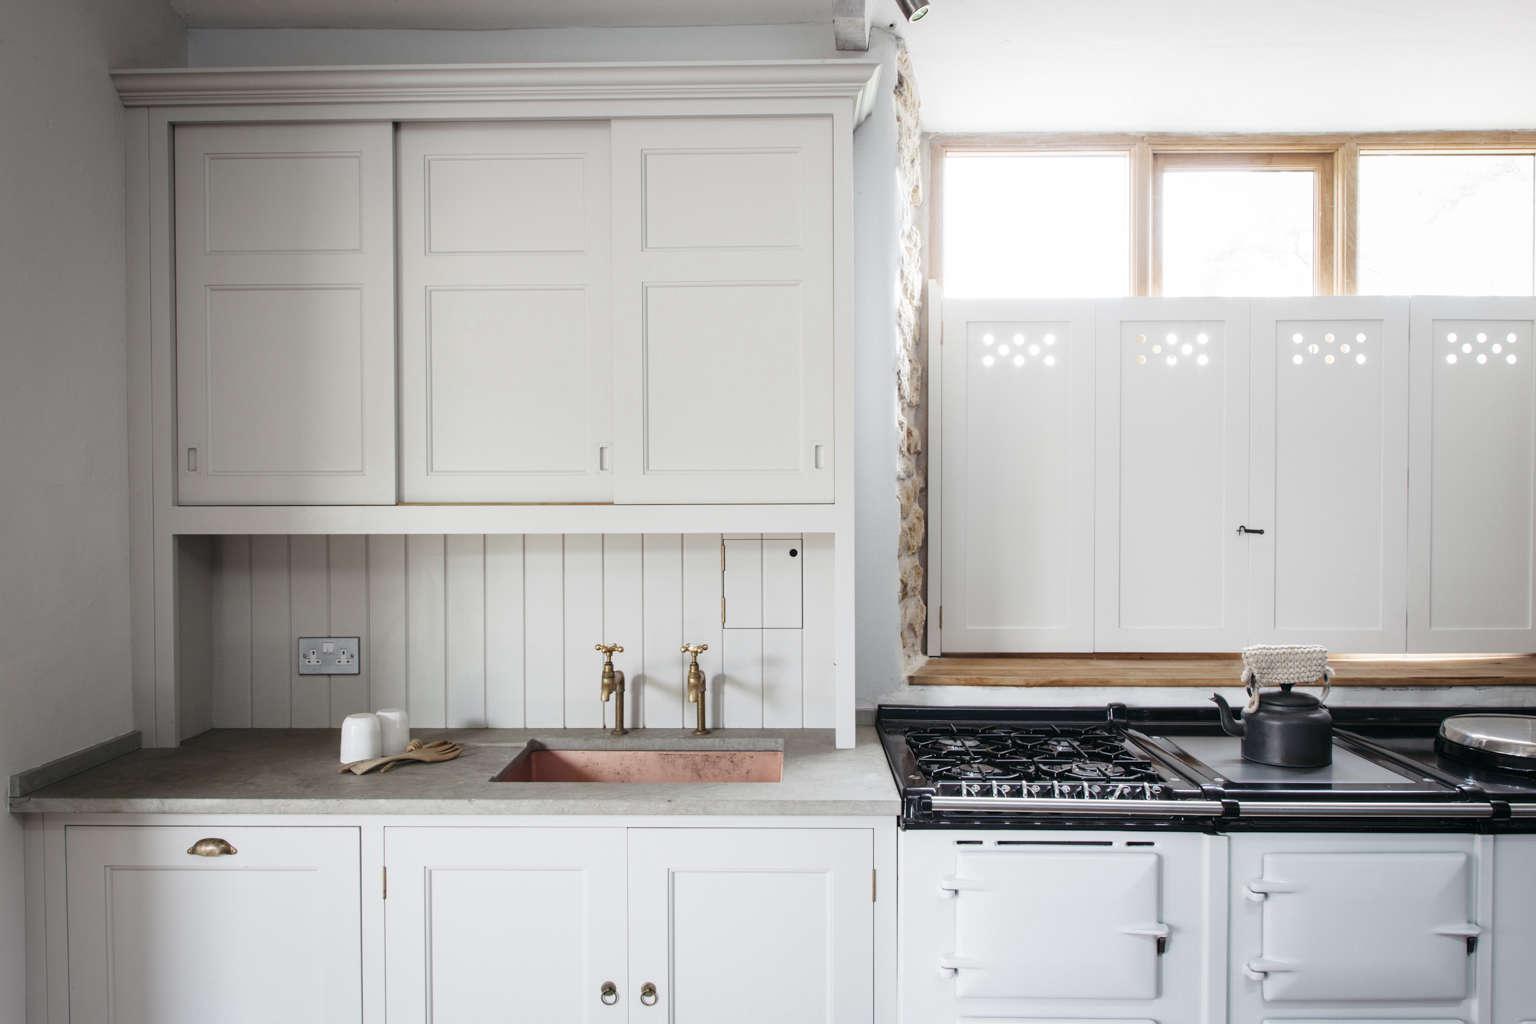 Pierced wood interior shutters in a Dorset farmhouse kitchen by Plain English